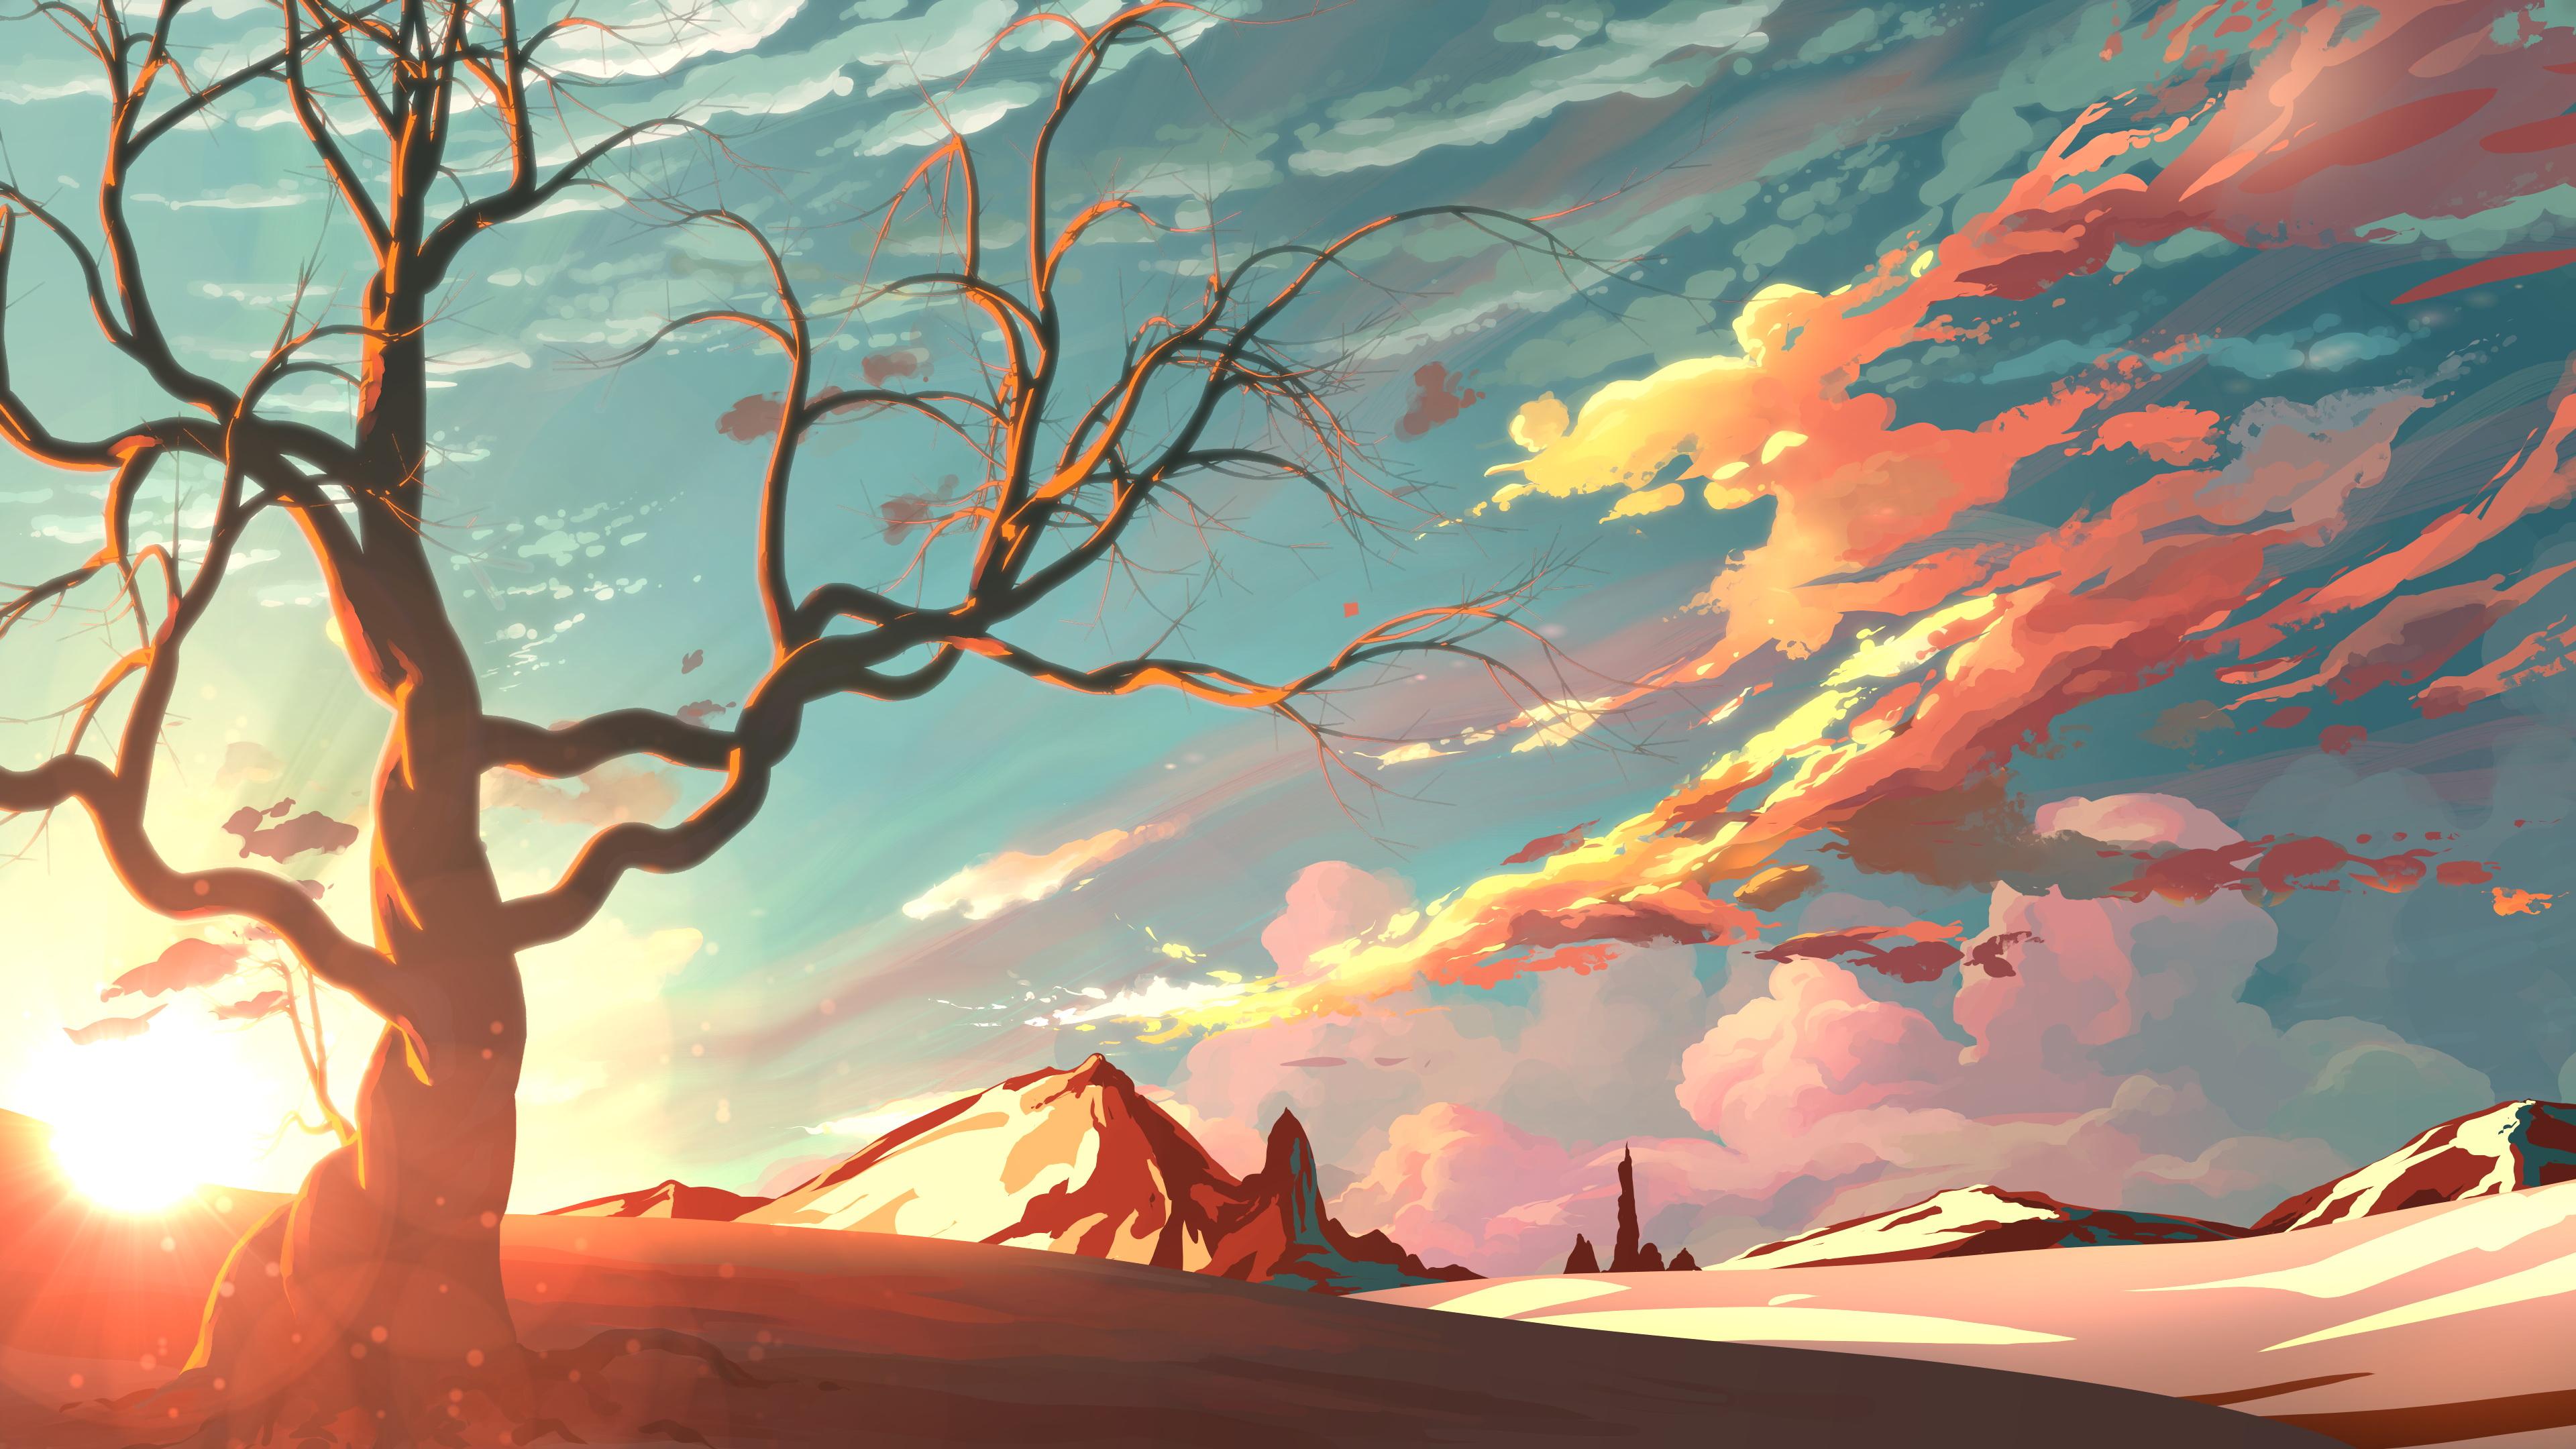 Planet Fantasy Art 4k Hd Desktop Wallpaper For 4k Ultra: Red Sky Mountains Trees Digital Art Painting 4k, HD Artist